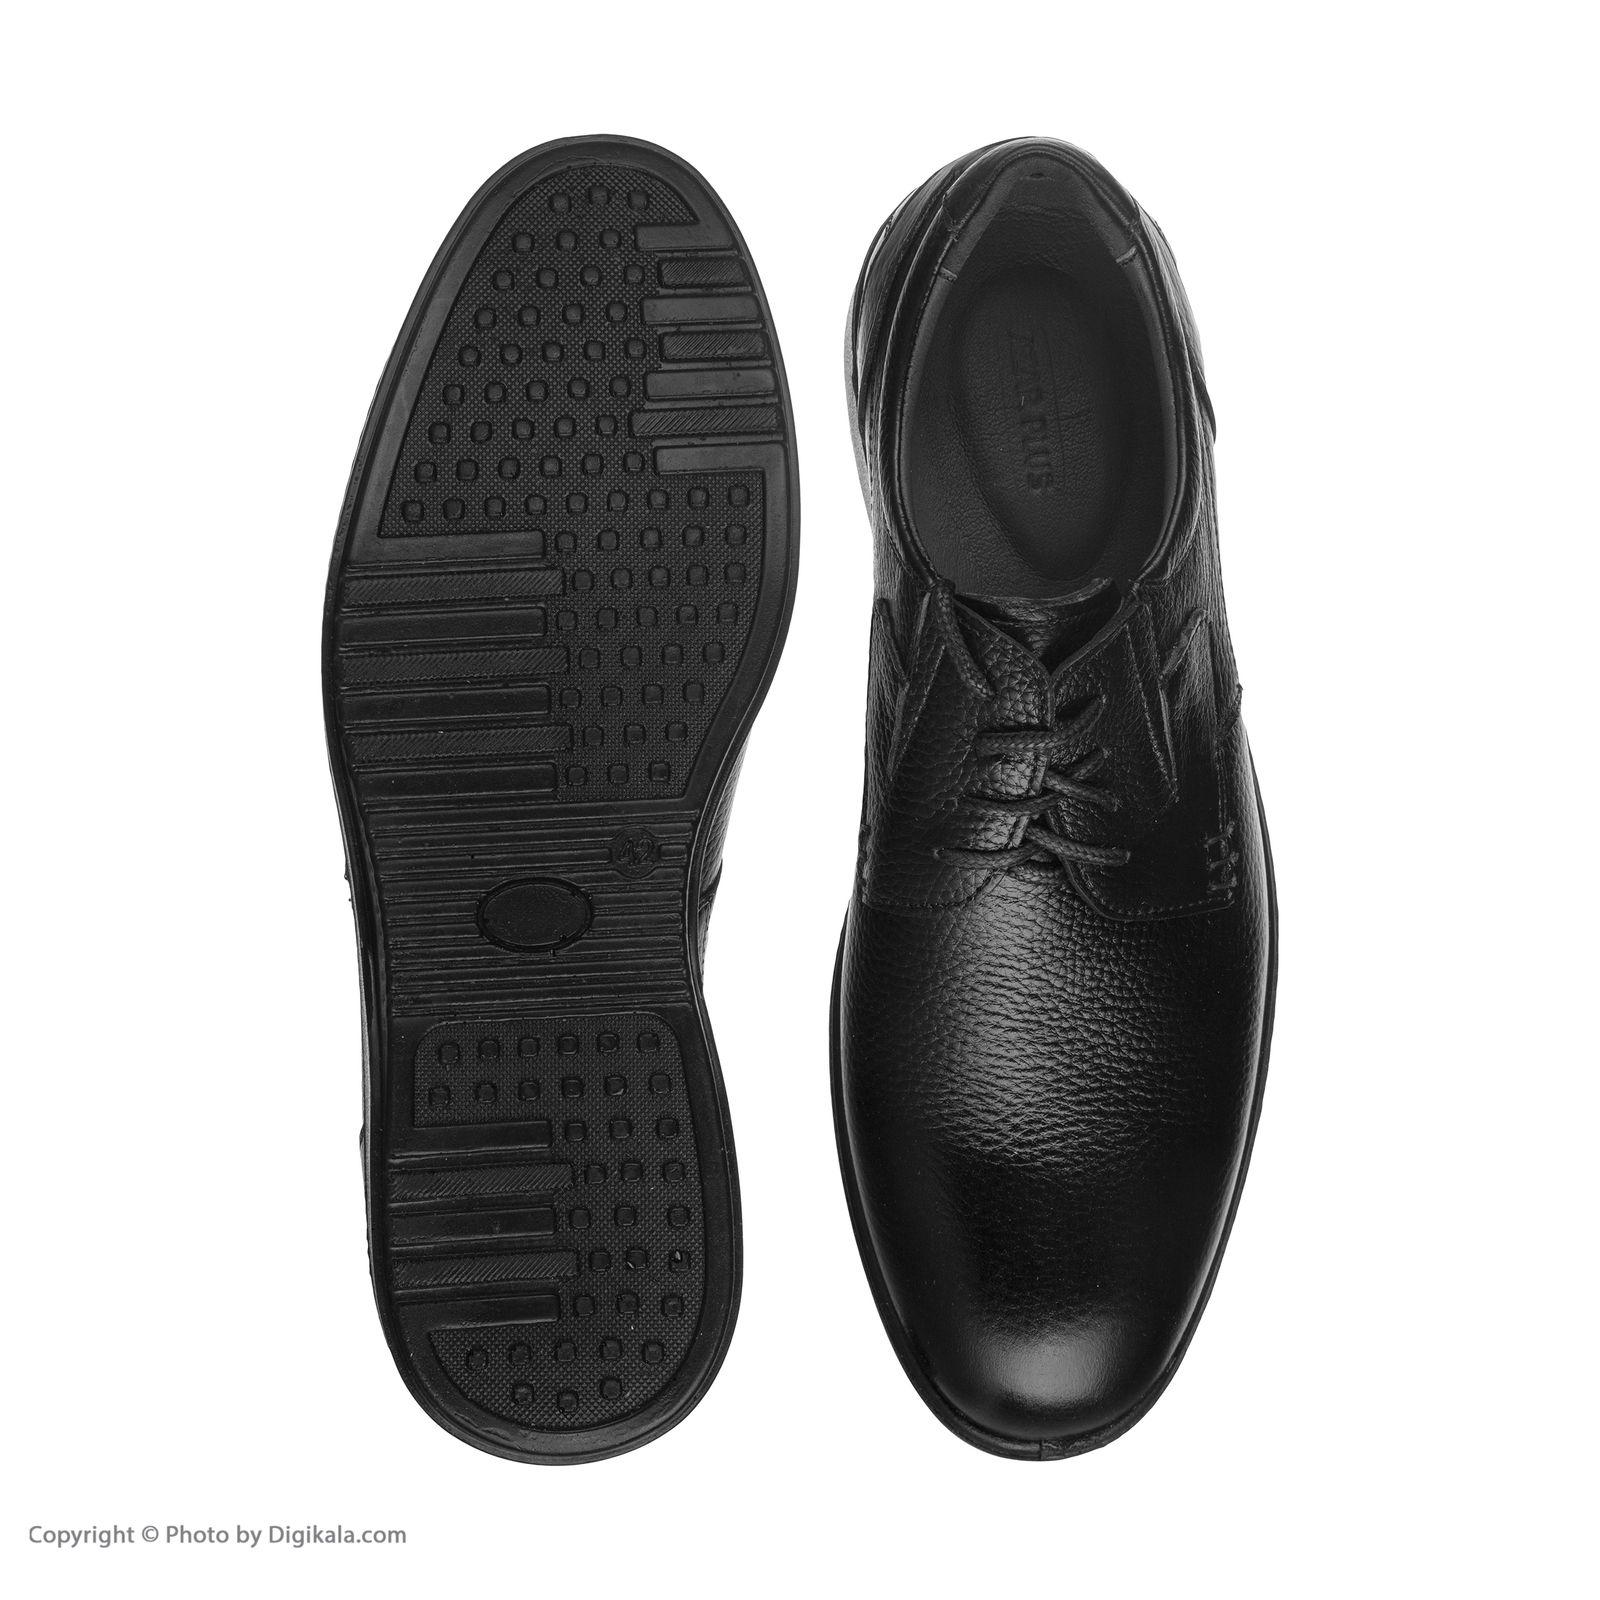 کفش روزمره مردانه آذر پلاس مدل 9438B503101 -  - 4